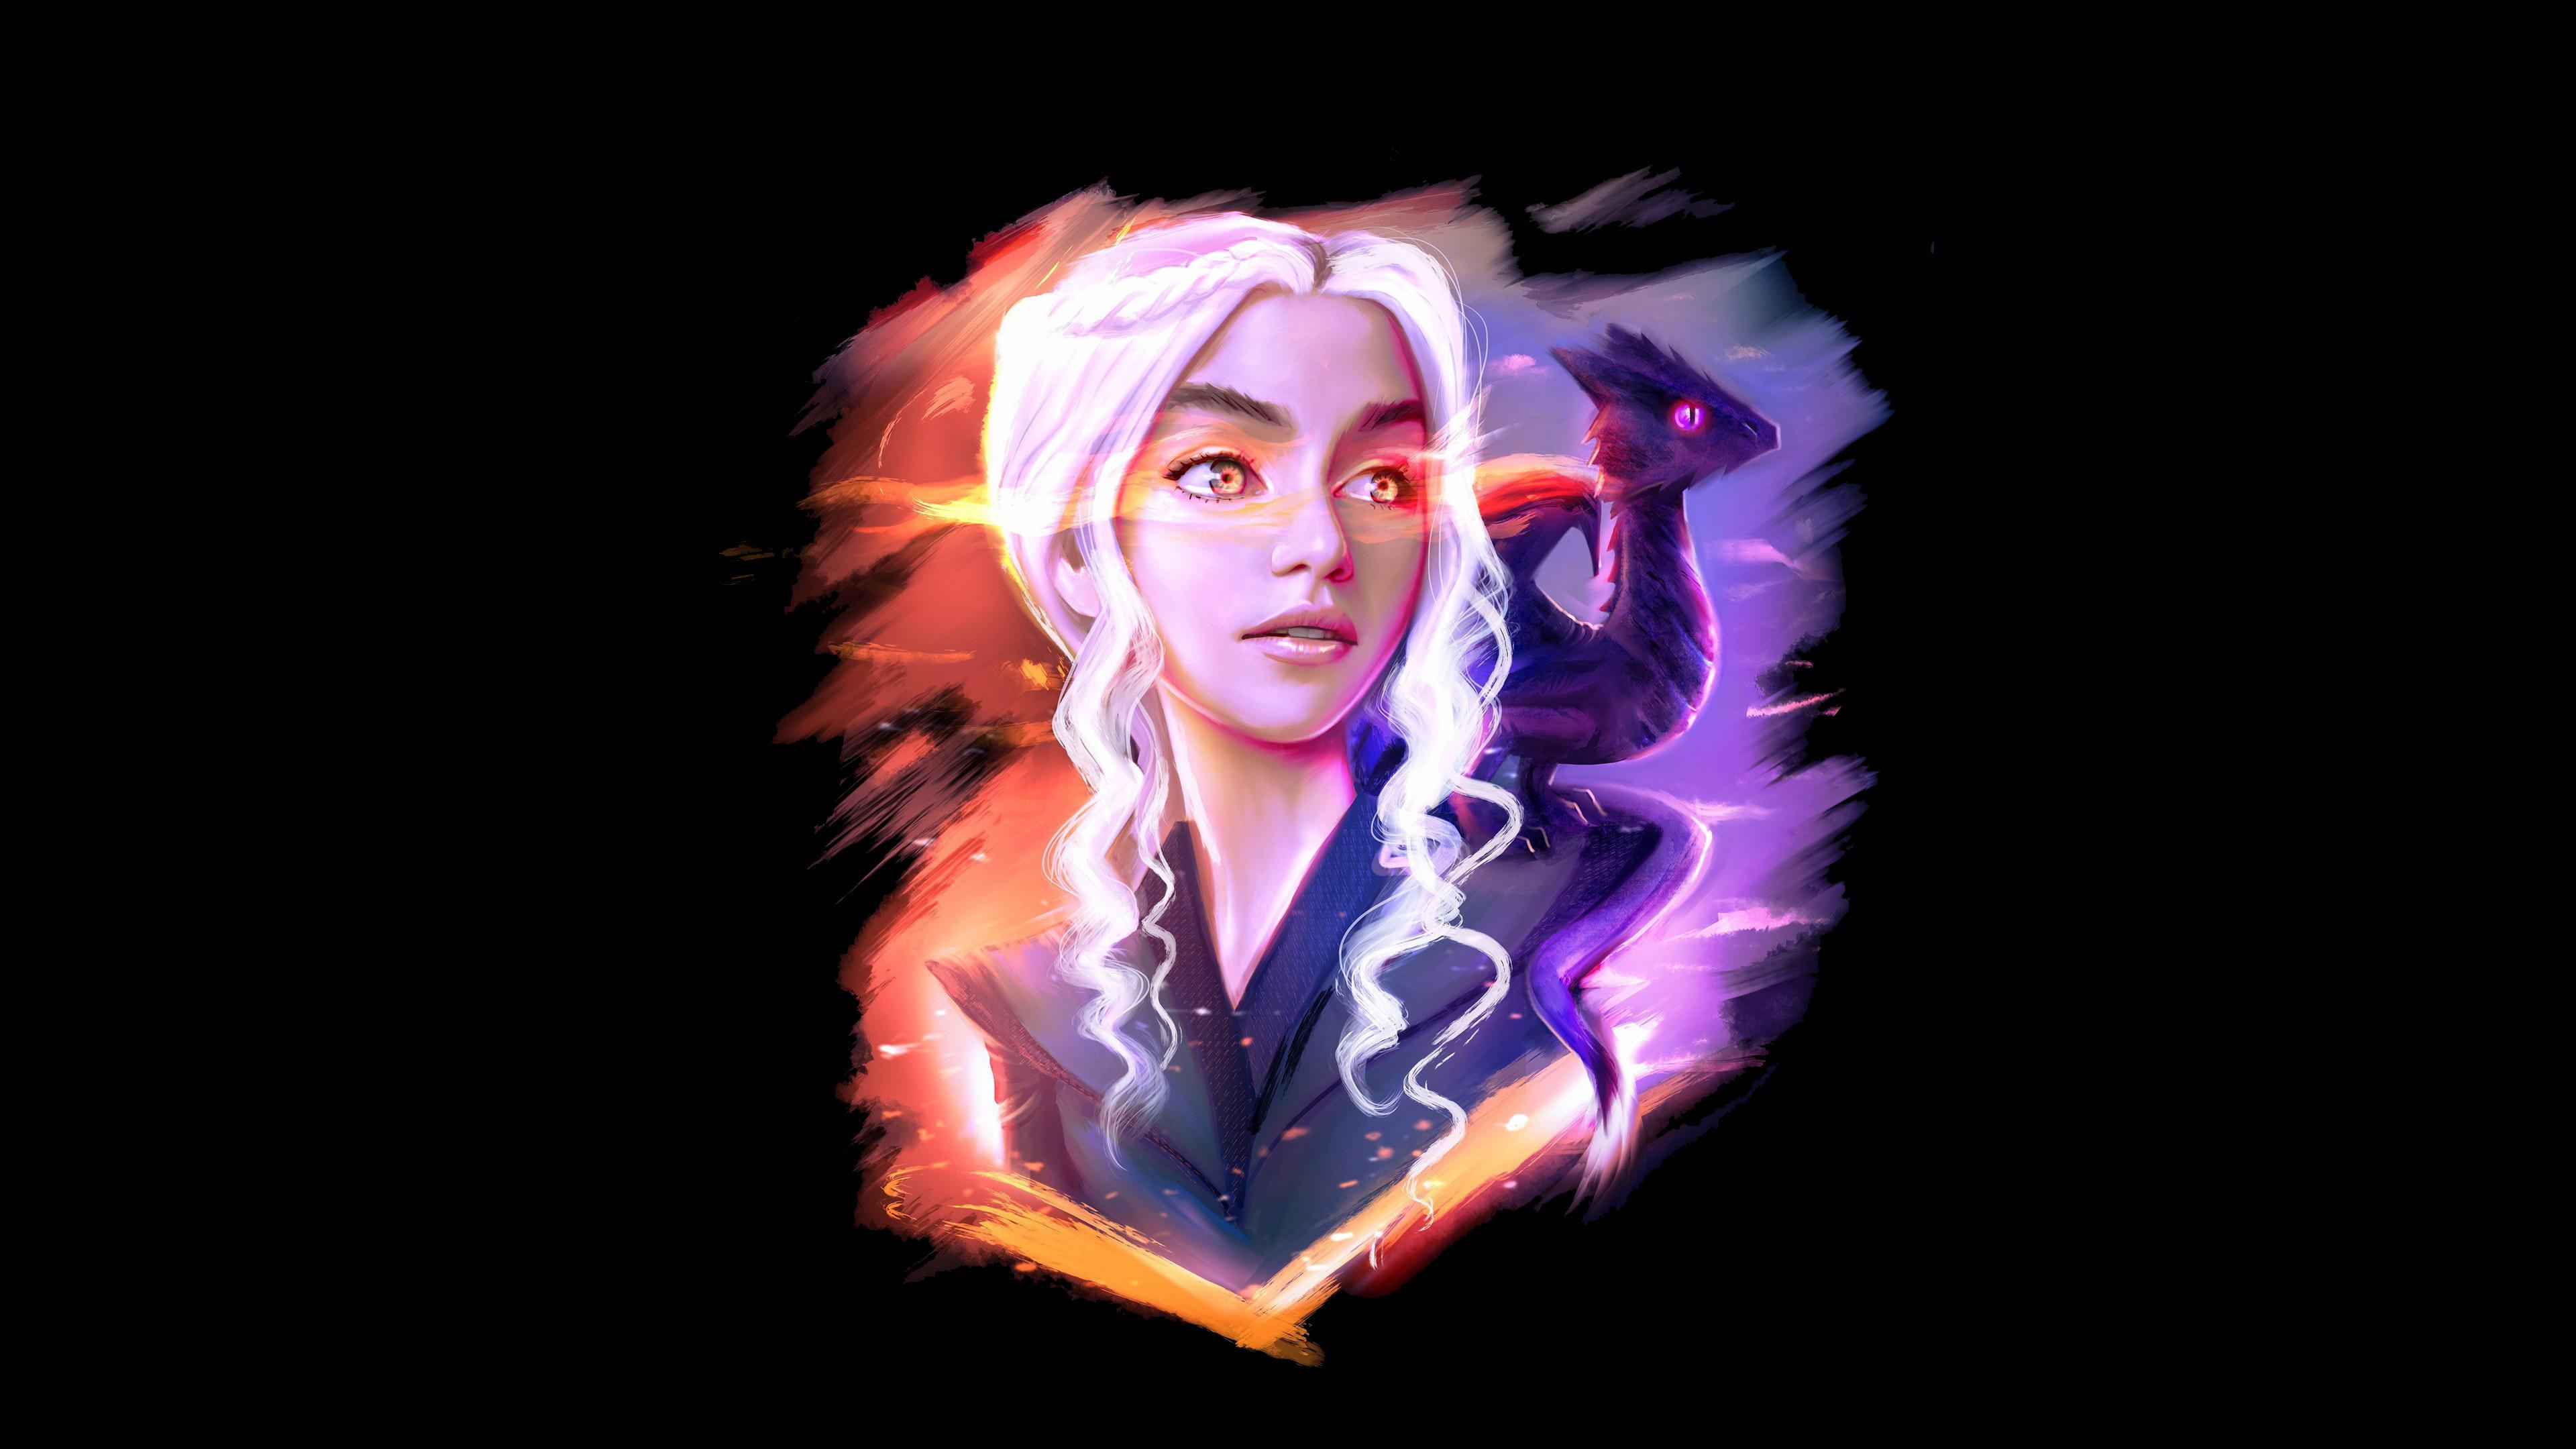 Download 3840x2400 Wallpaper Daenerys Targaryen And Dragon Game